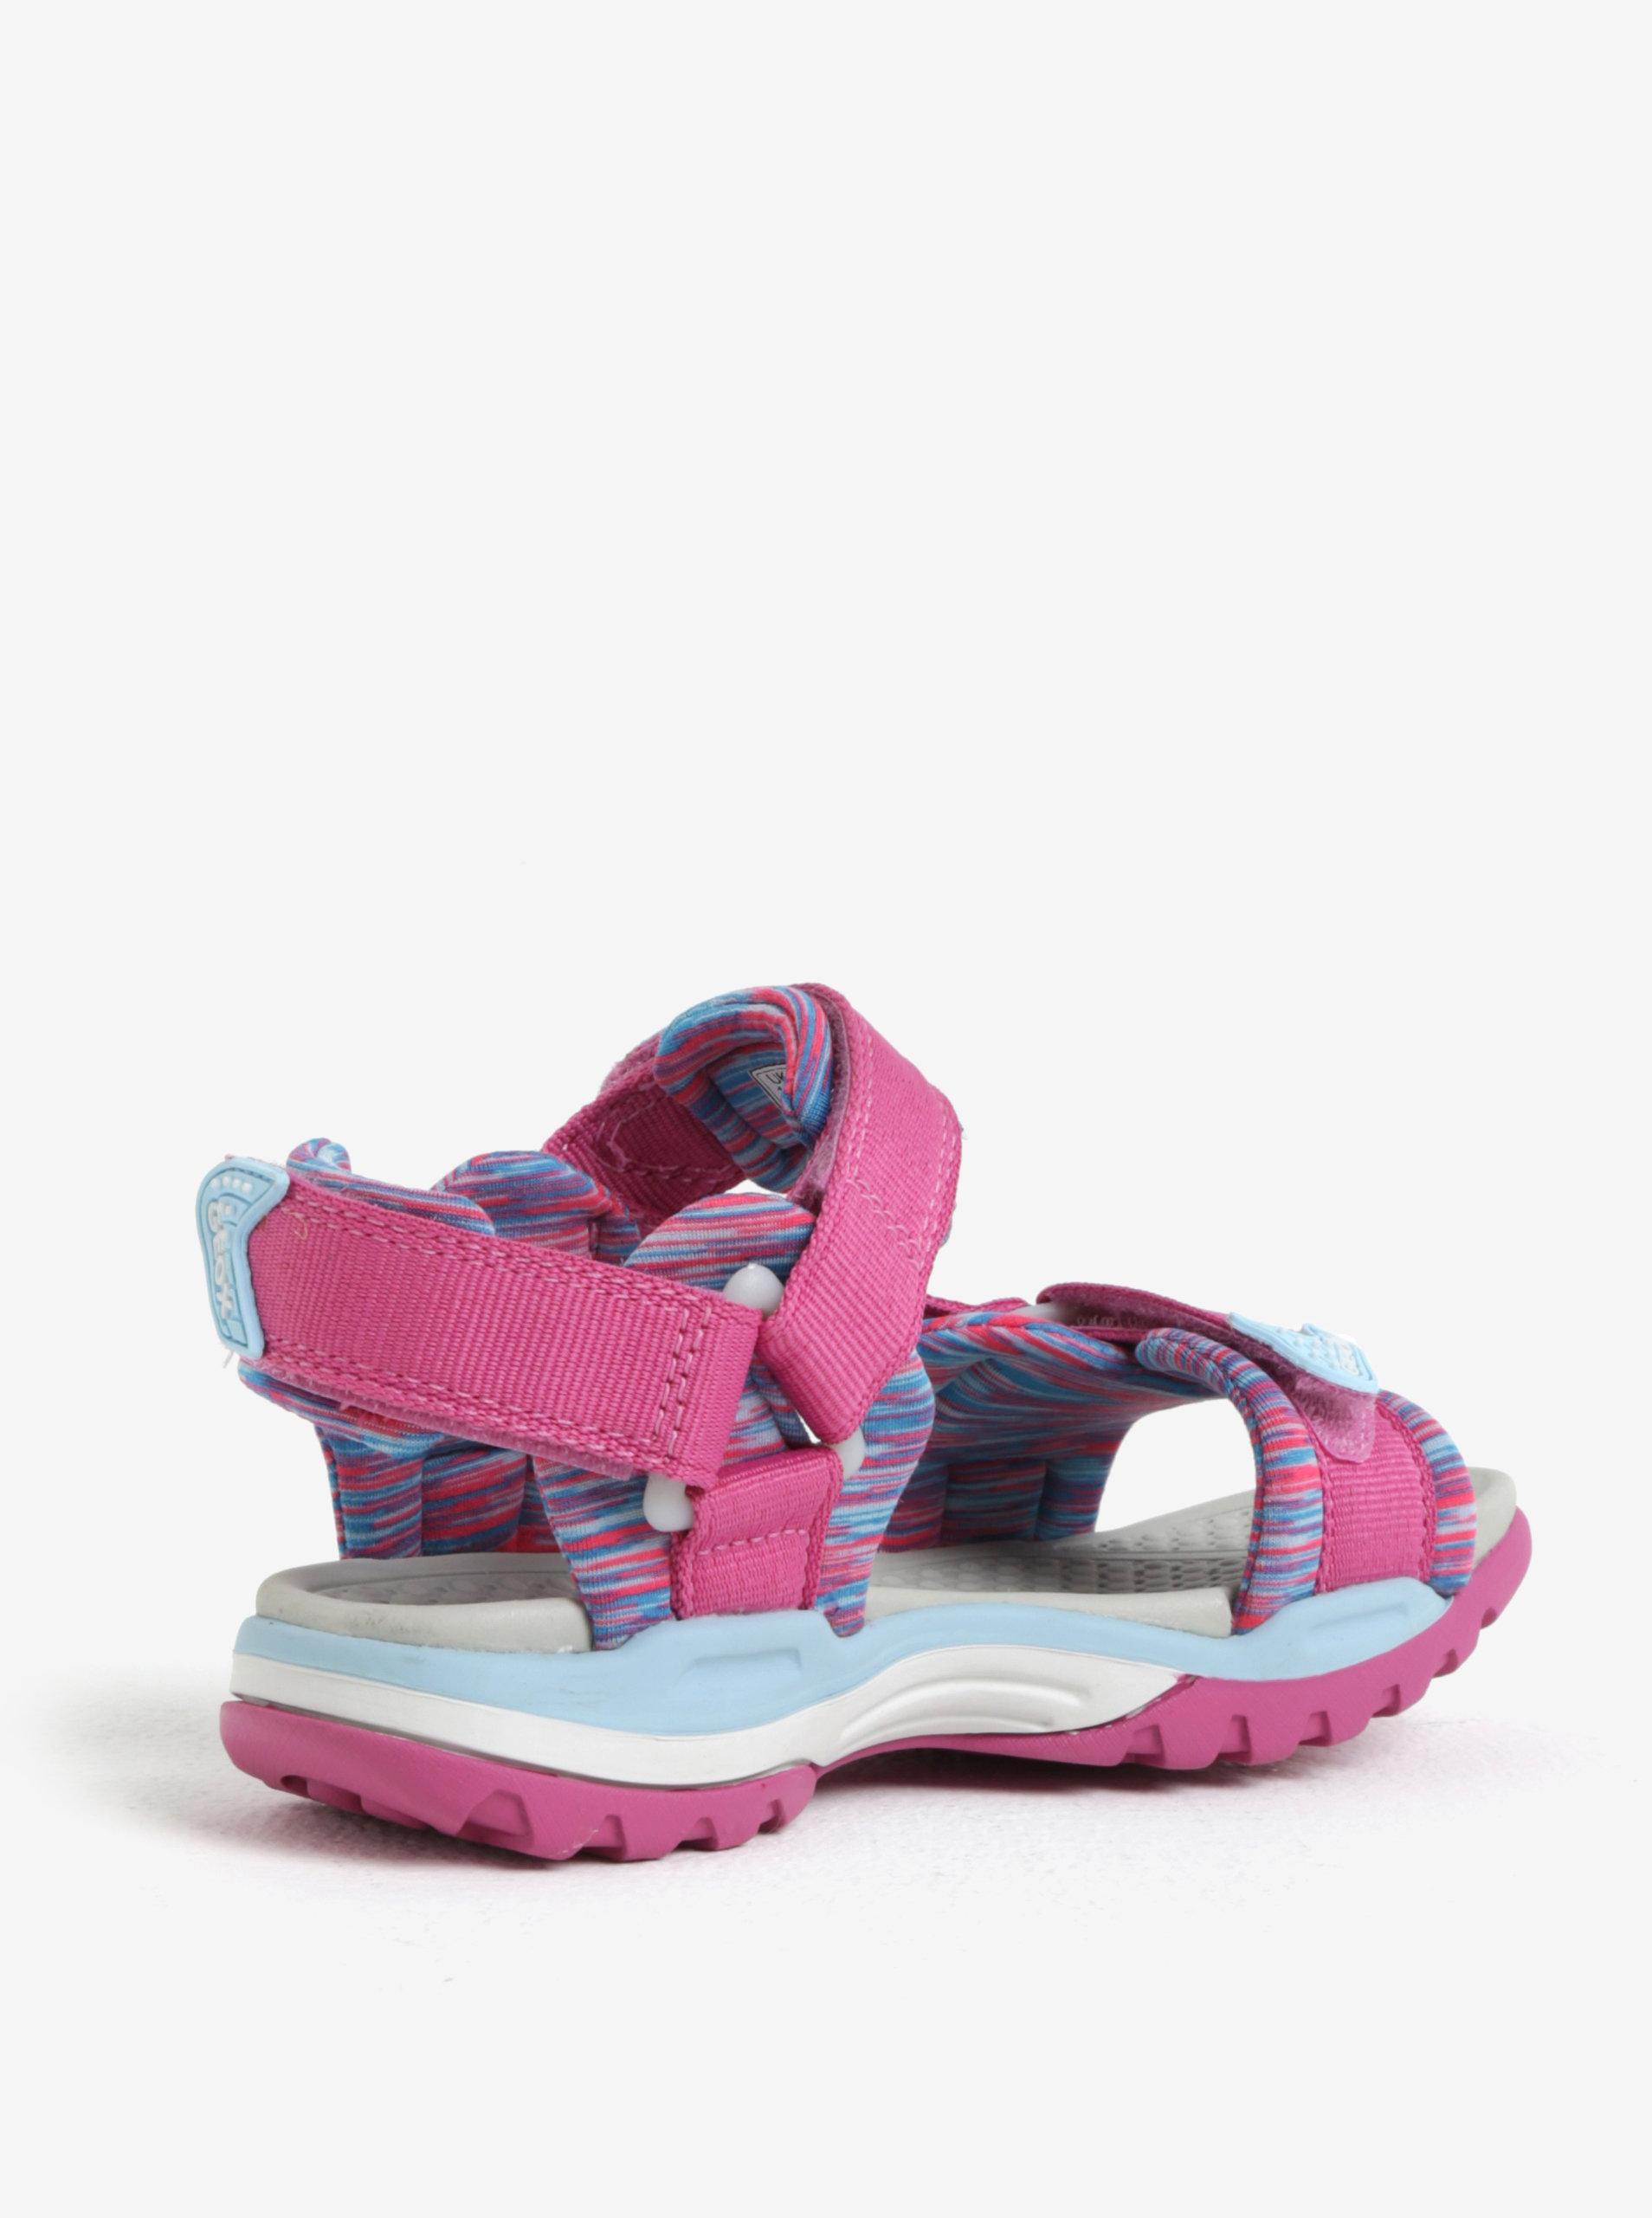 381d391859fa Modro-ružové dievčenské sandále Geox Borealis ...